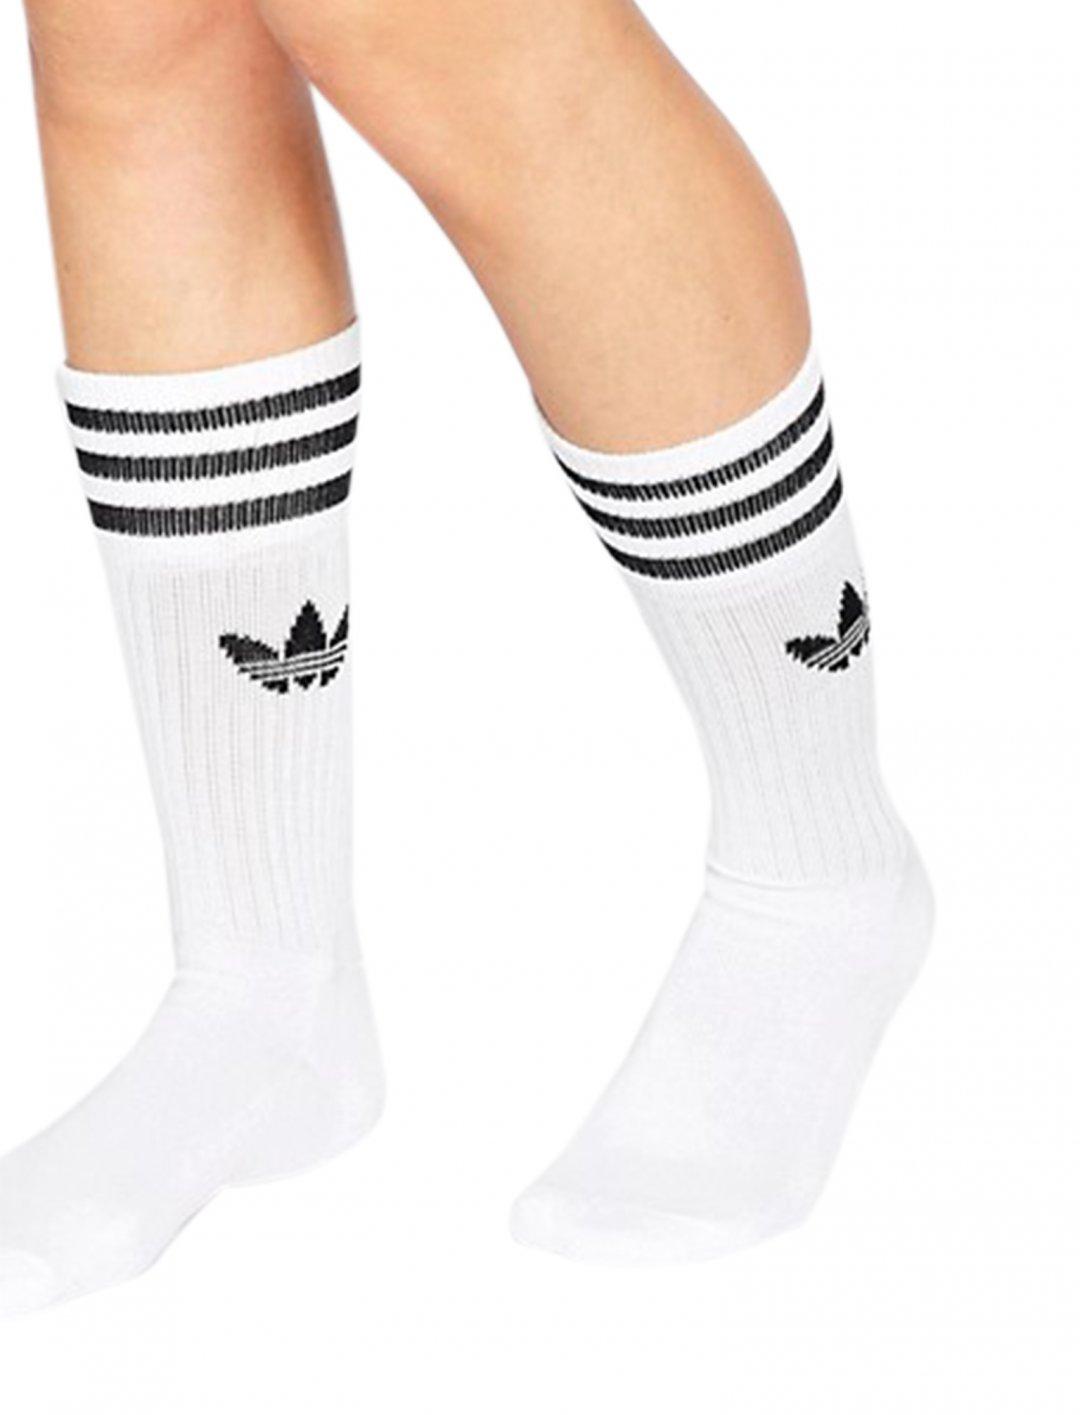 "Adidas Originals Socks {""id"":16,""product_section_id"":1,""name"":""Accessories"",""order"":15} Adidas Originals"